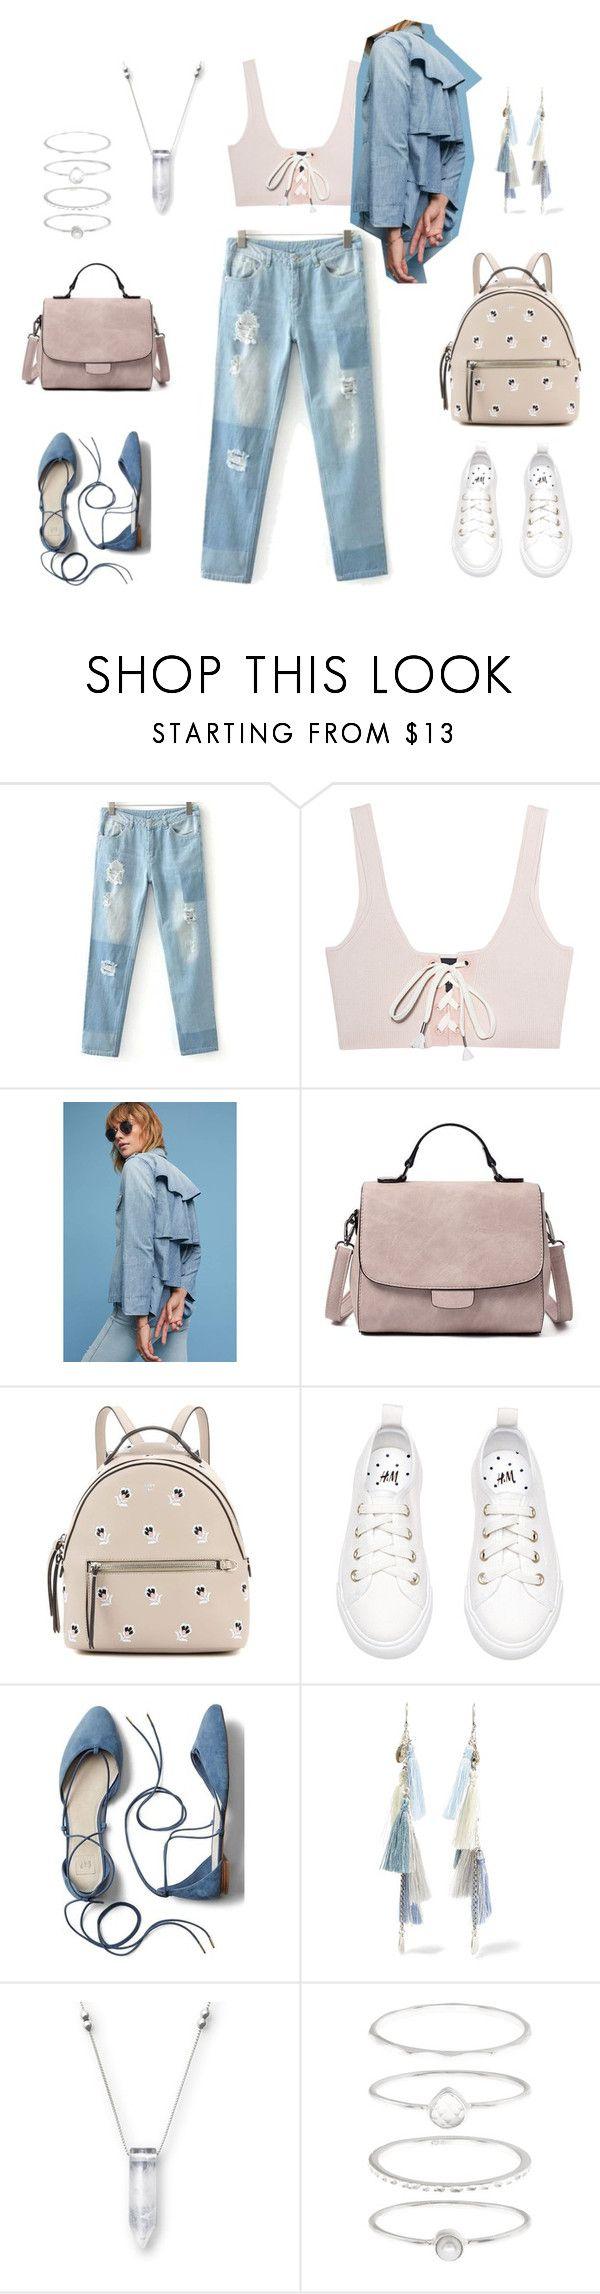 1 by tatiana-saksonova on Polyvore featuring мода, Puma, AMO, Gap, Fendi, Chan Luu and Accessorize